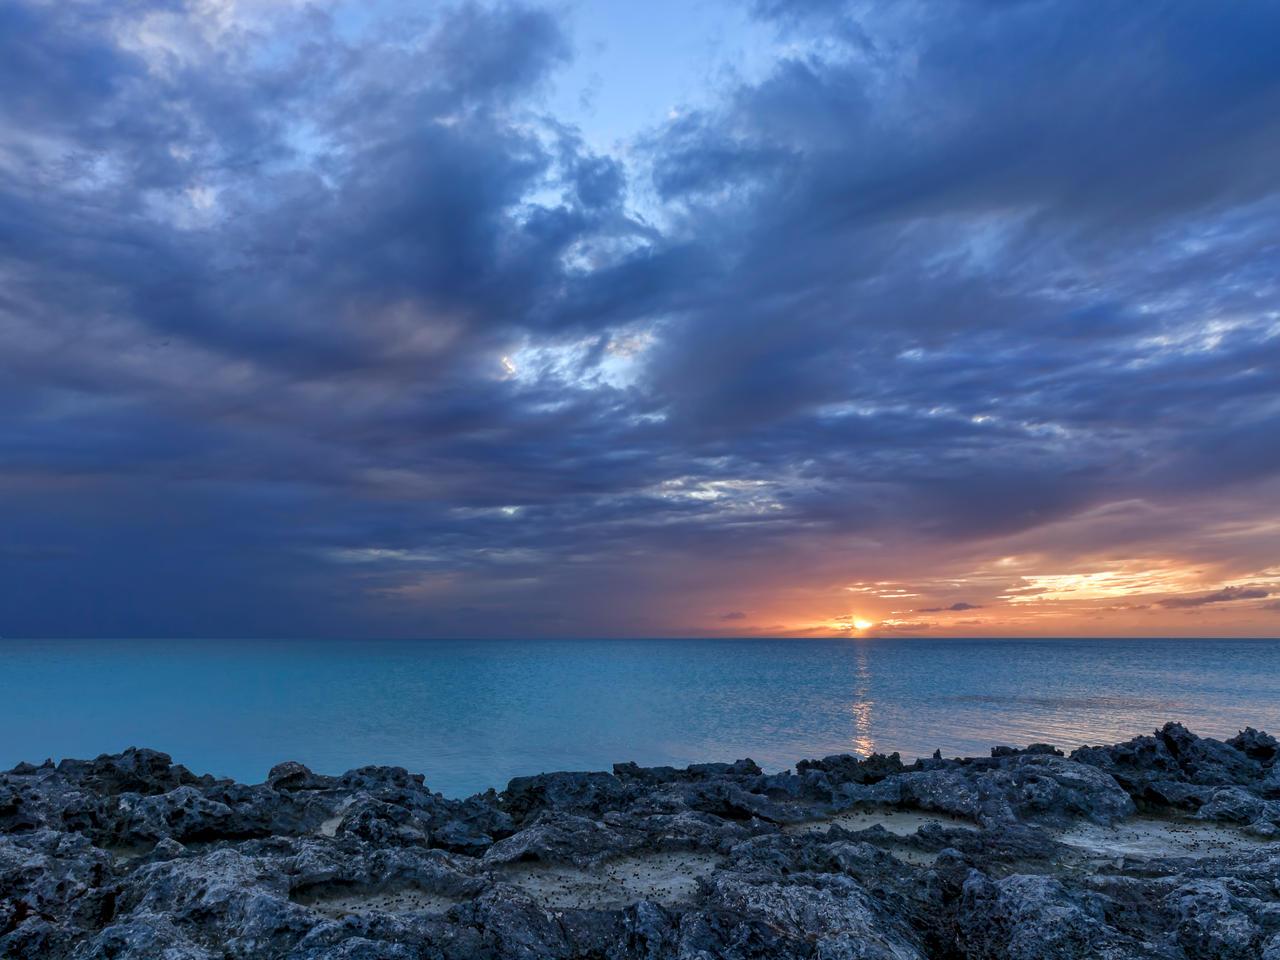 Half moon sunset by peterpateman